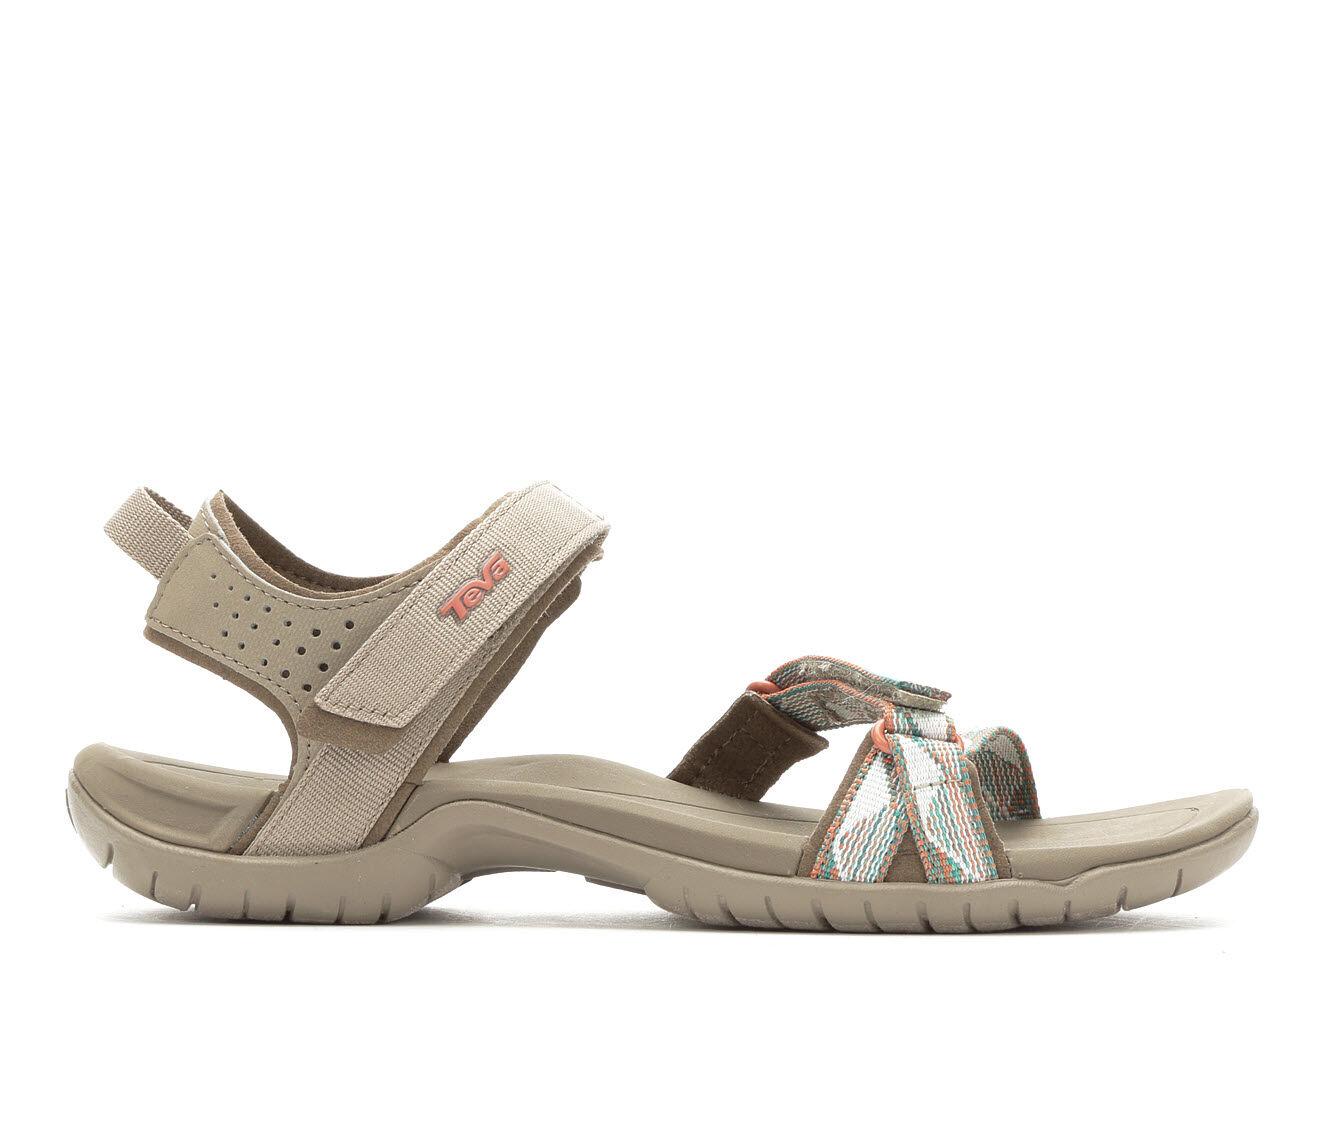 Women's Teva Verra Hiking Sandals Taupe Multi